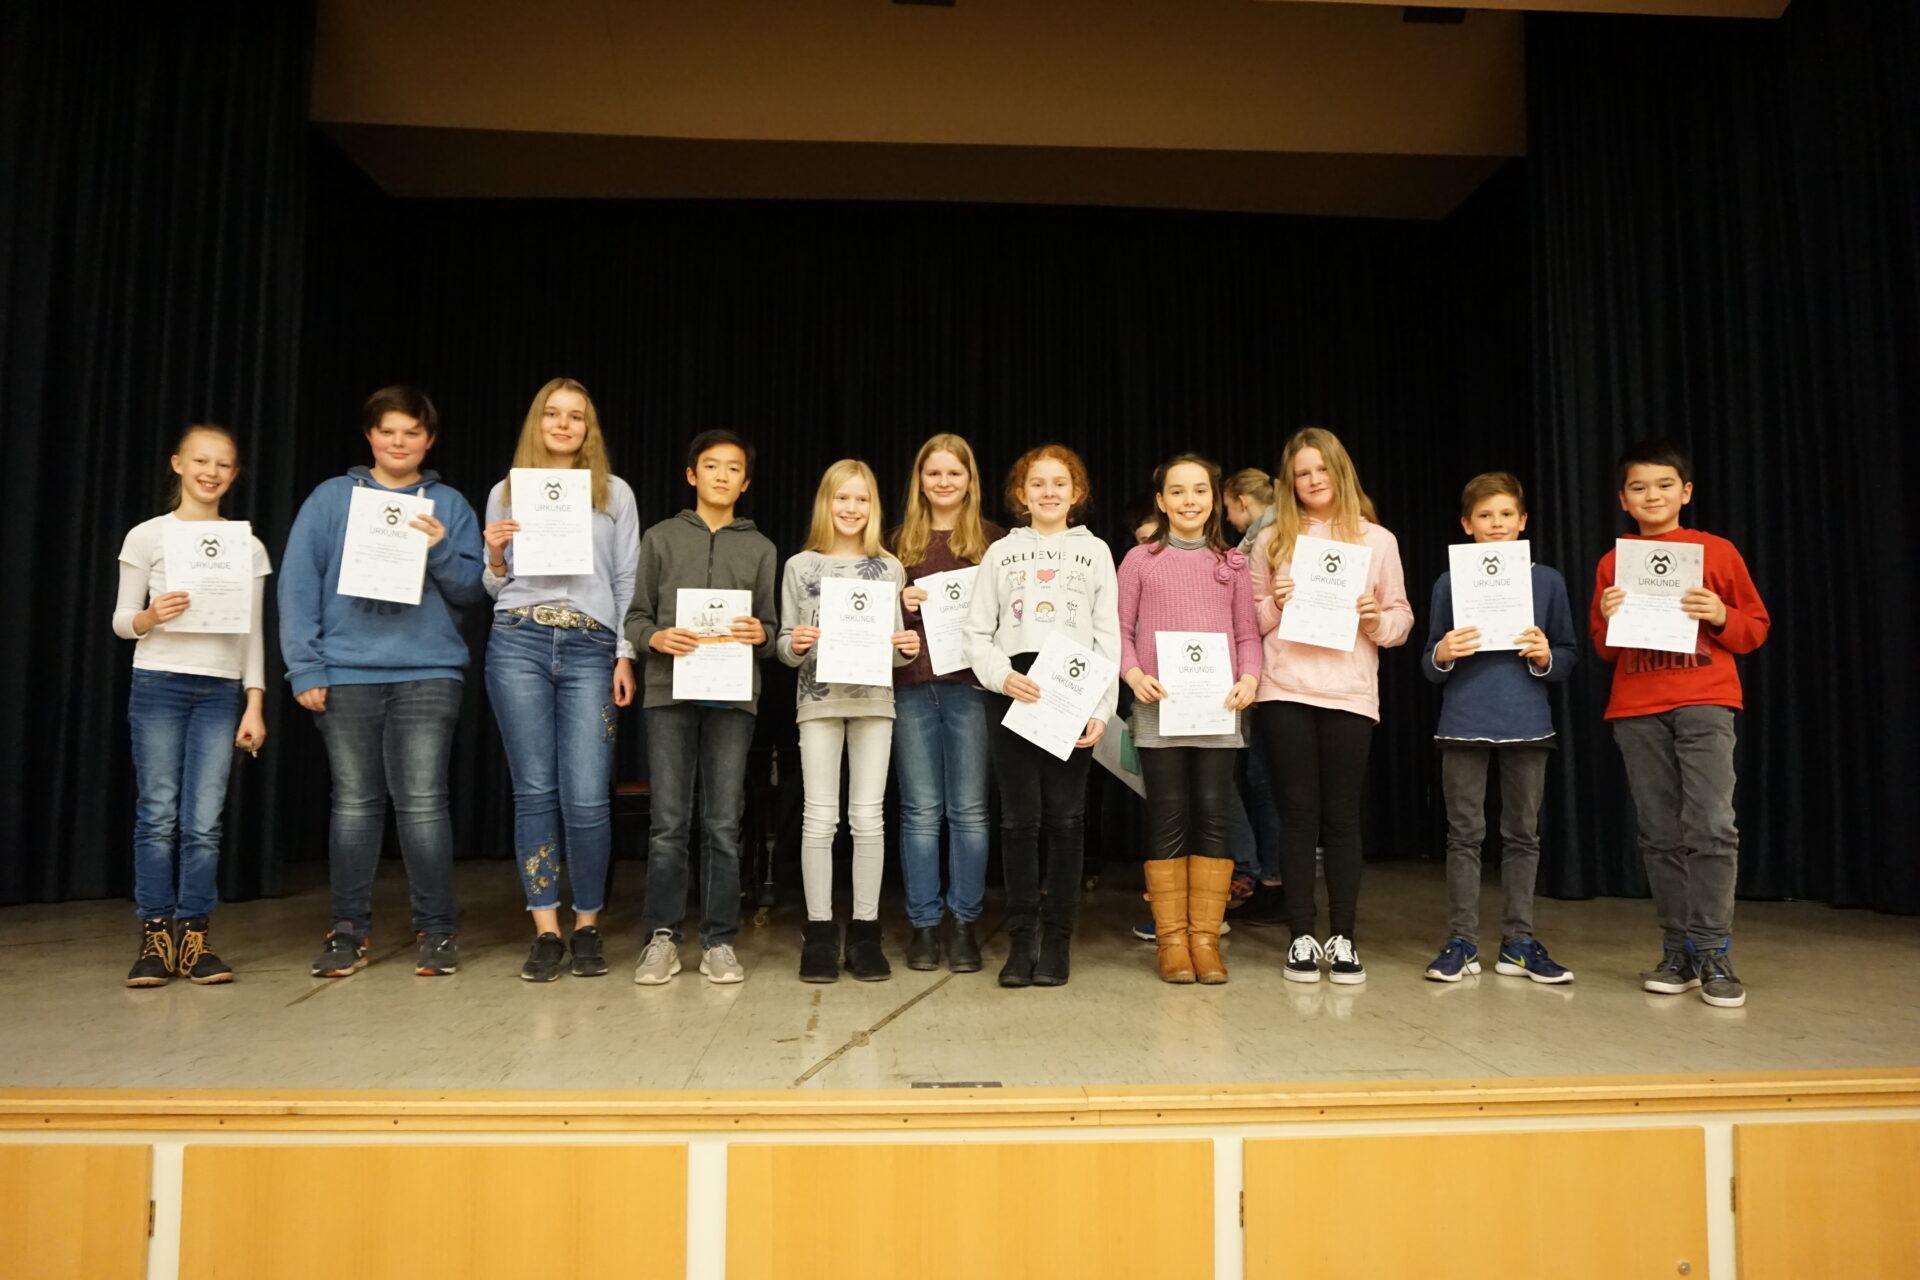 57. Mathematik-Olympiade: Viele Sieger am RTG